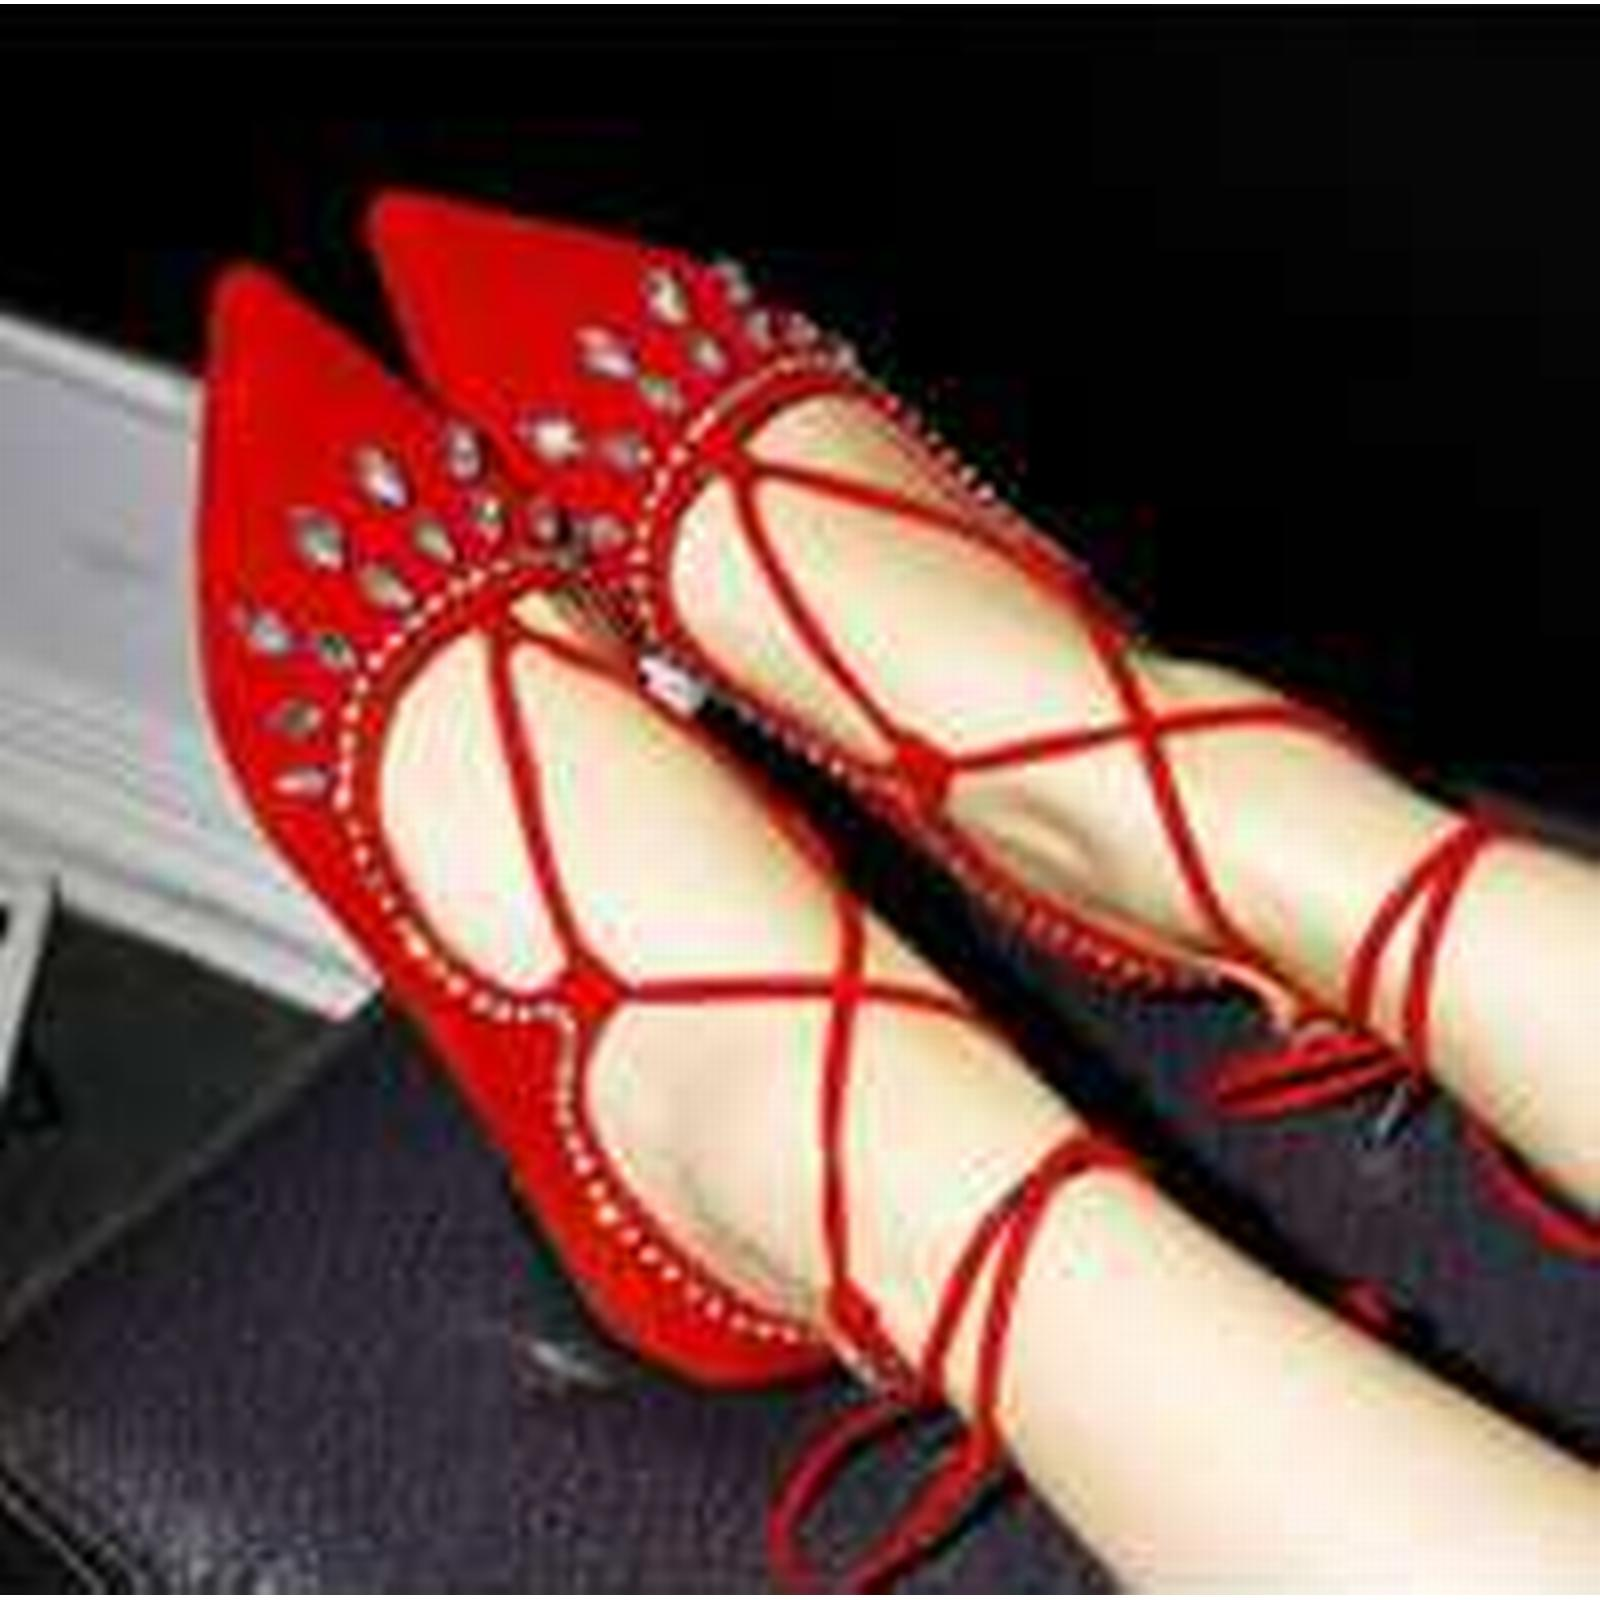 Bonanza pumps, (Global) pp297 Extra size gladiator pointy flat heeled pumps, Bonanza US Size 2-10.5 red 6b33d6